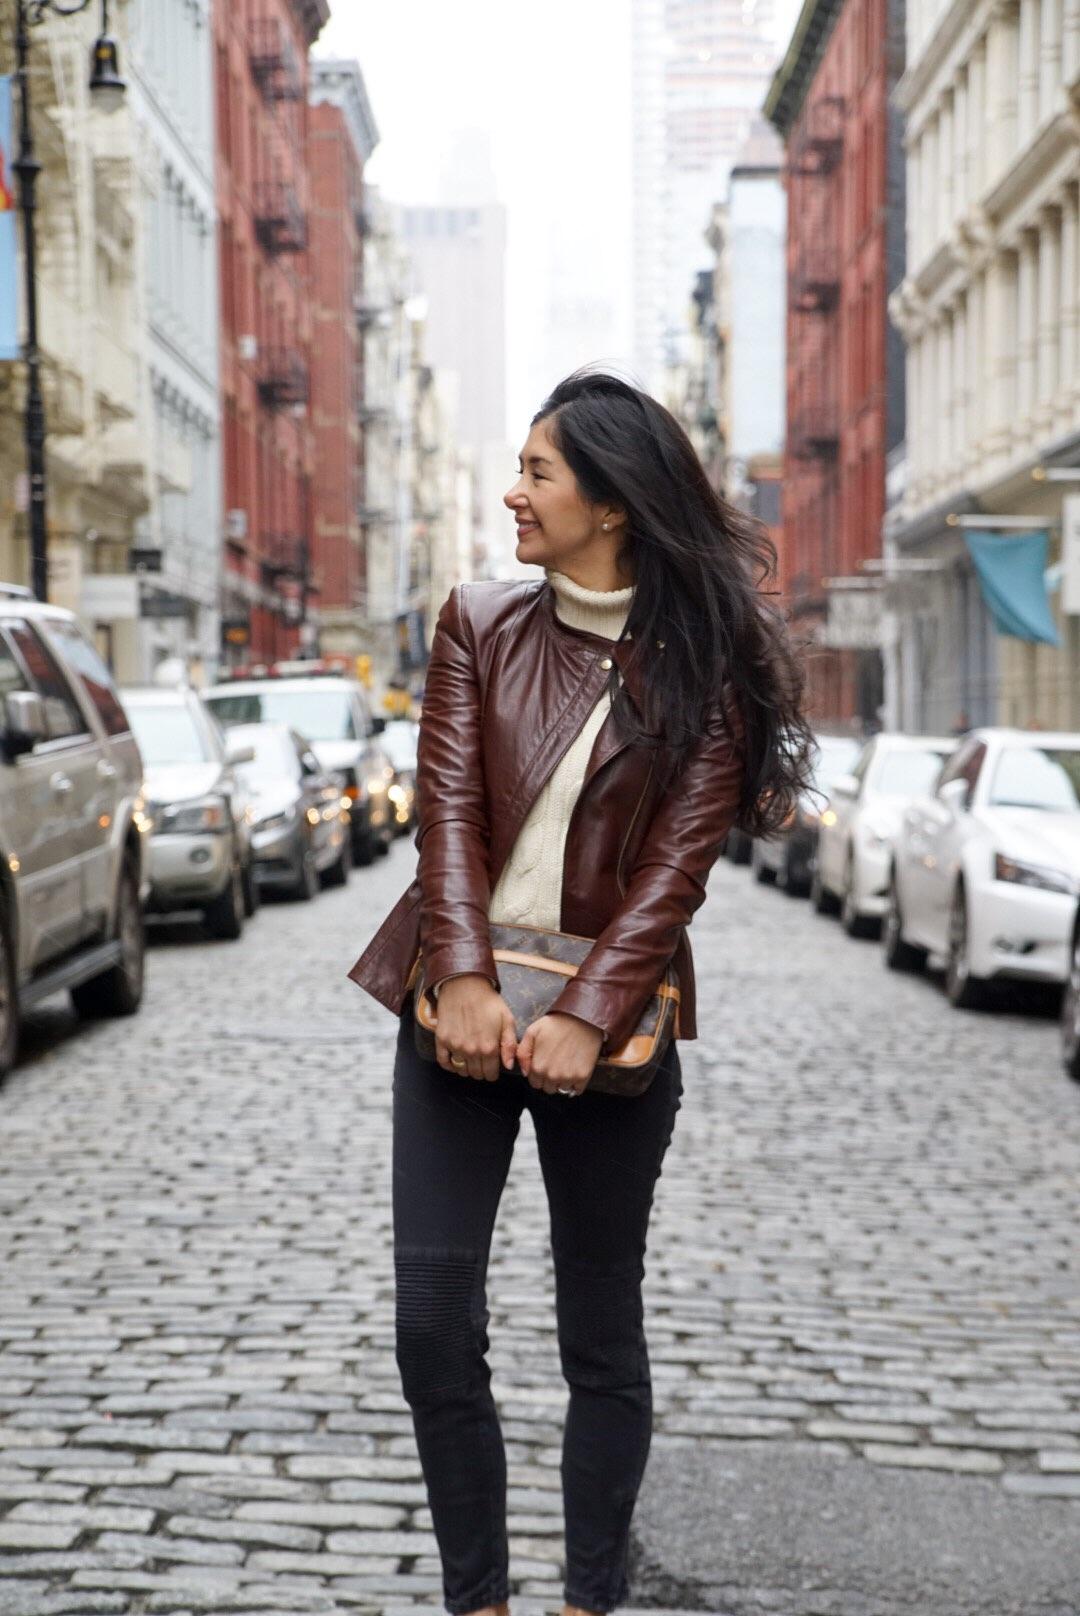 Soho New York Zara Leather Jacket Ralph Lauren Turtleneck Zara Moto Jeans Chanel Ballet Flats Louis Vuitton Clutch 2.jpg